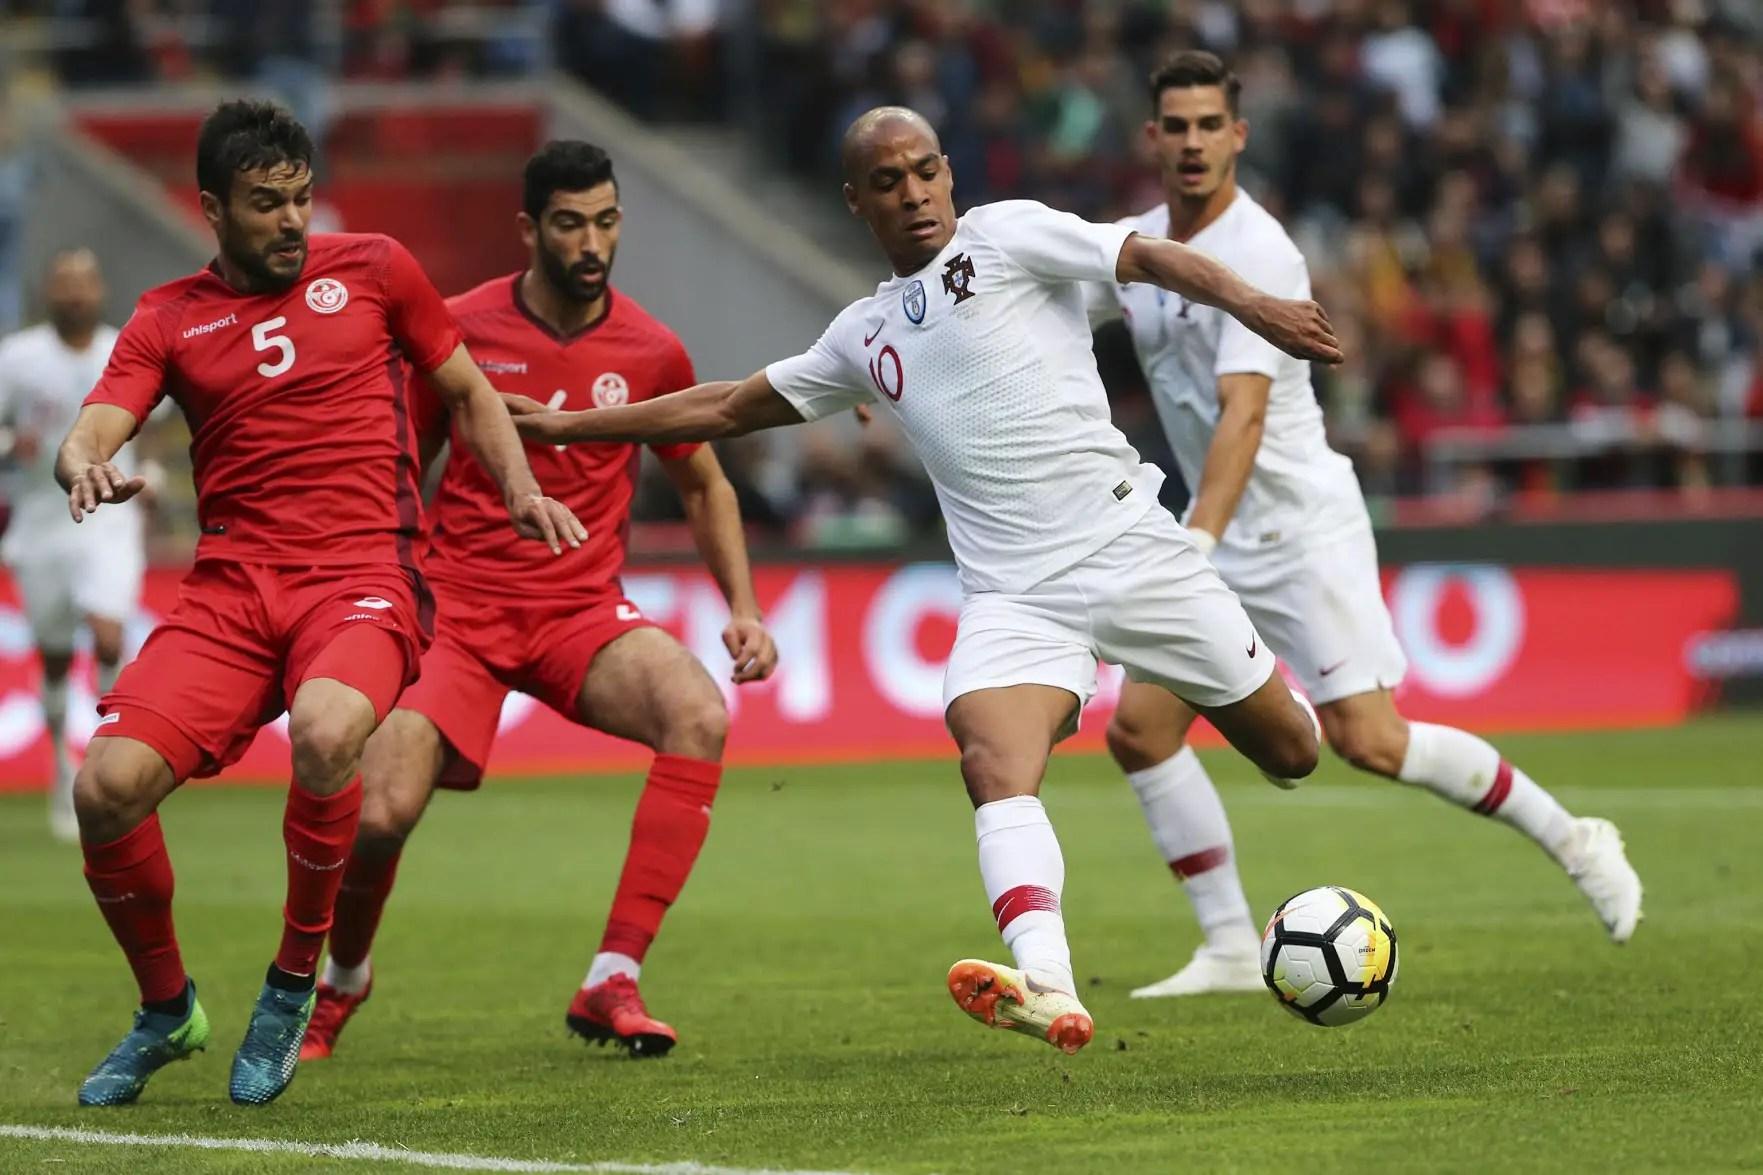 Int'l Friendlies: Tunisia Hold Portugal, Balotelli Scores In Italy Win, France Edge Ireland